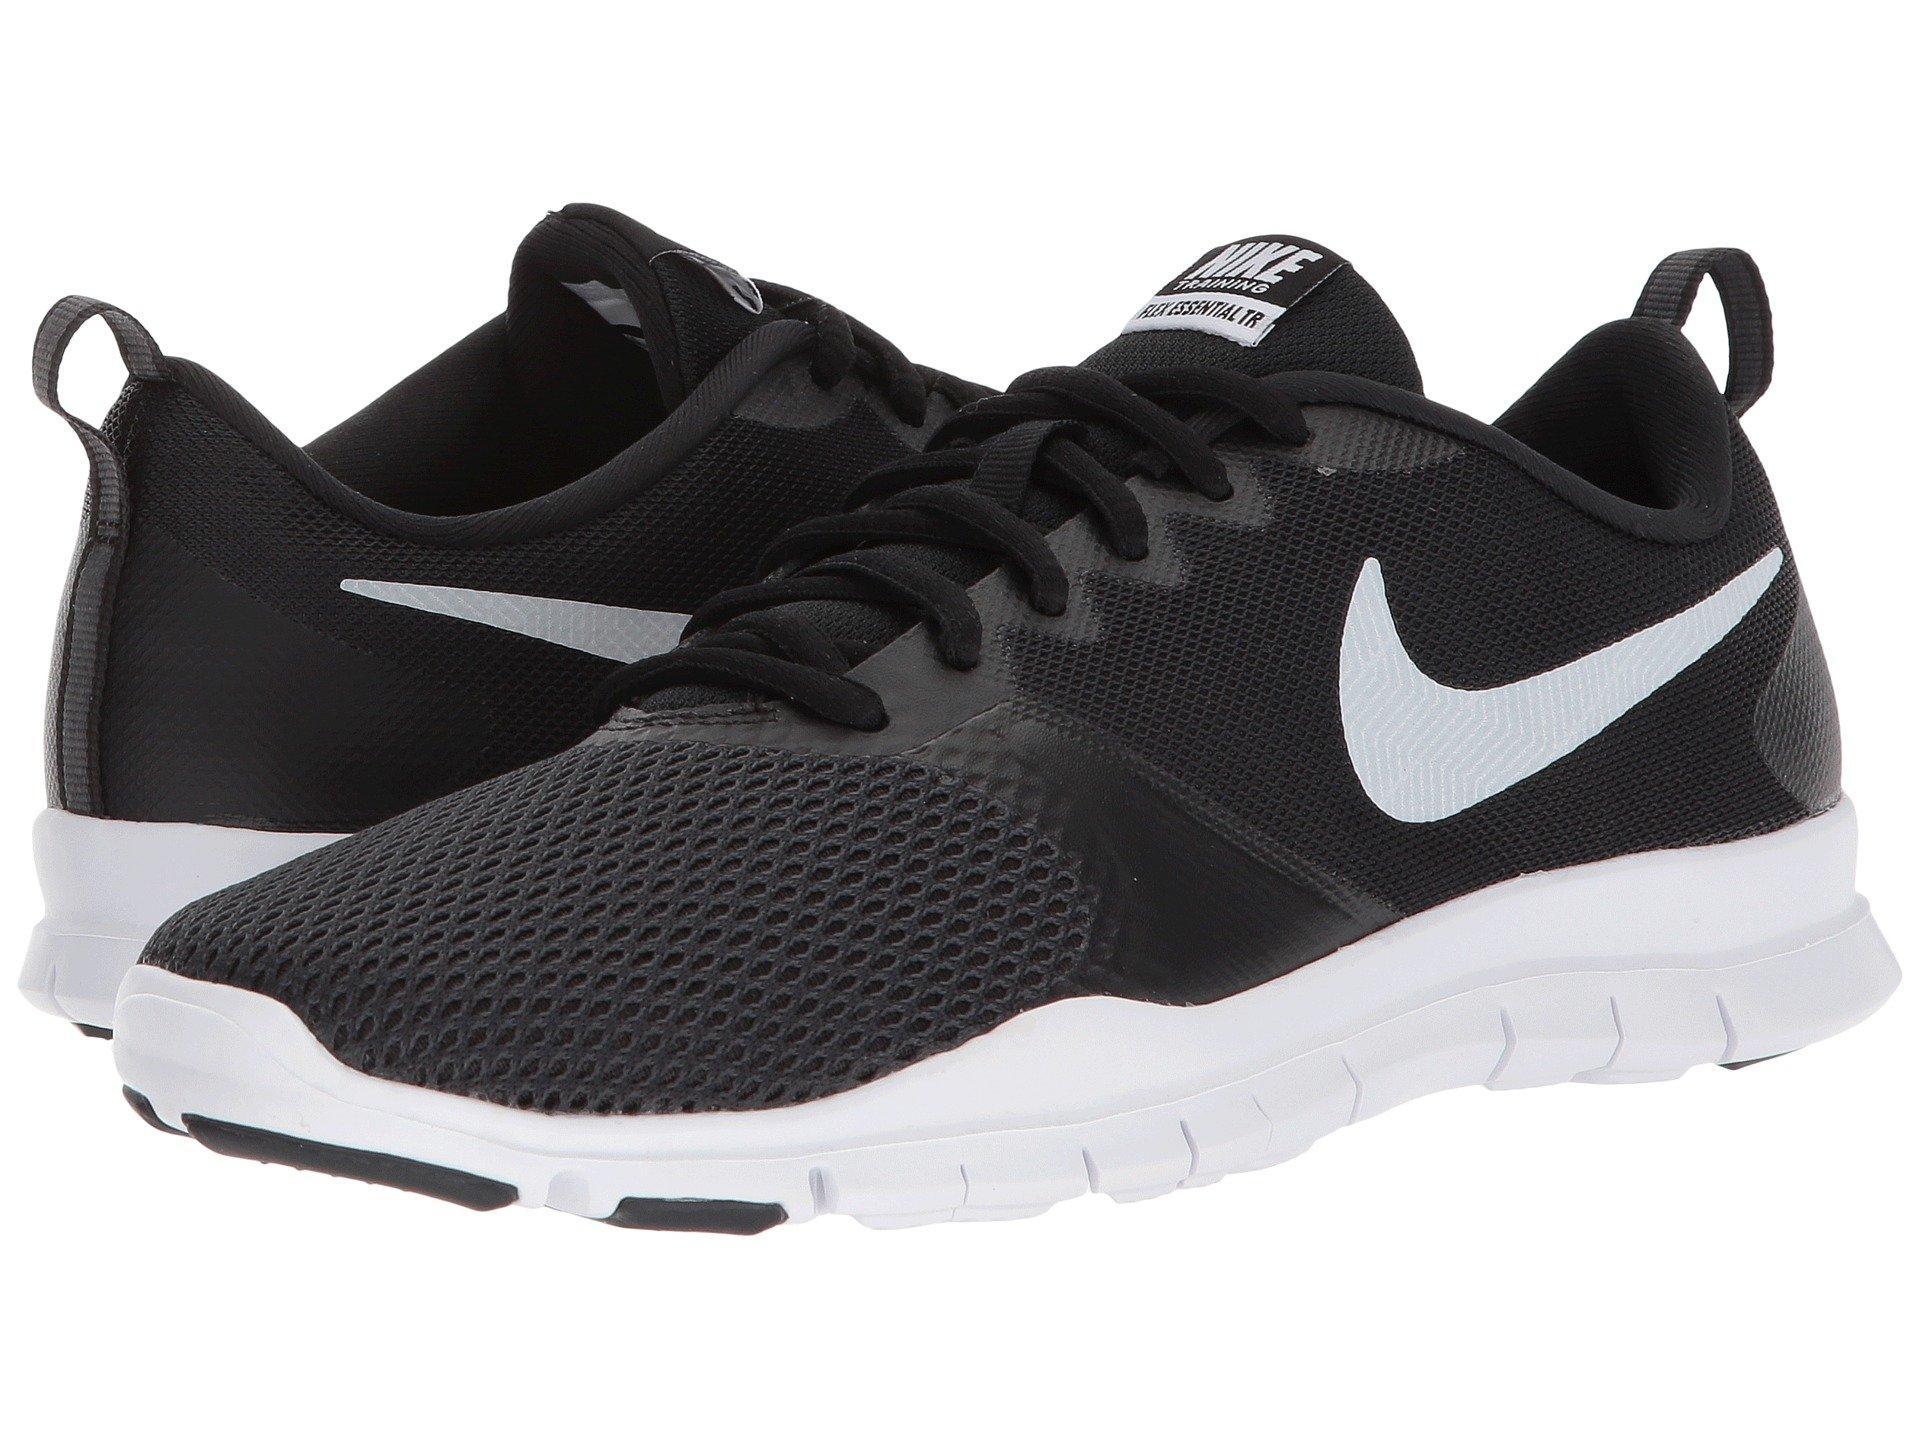 006b1e5b974 Lyst - Nike Flex Essential Tr (white wolf Grey pure Platinum ...